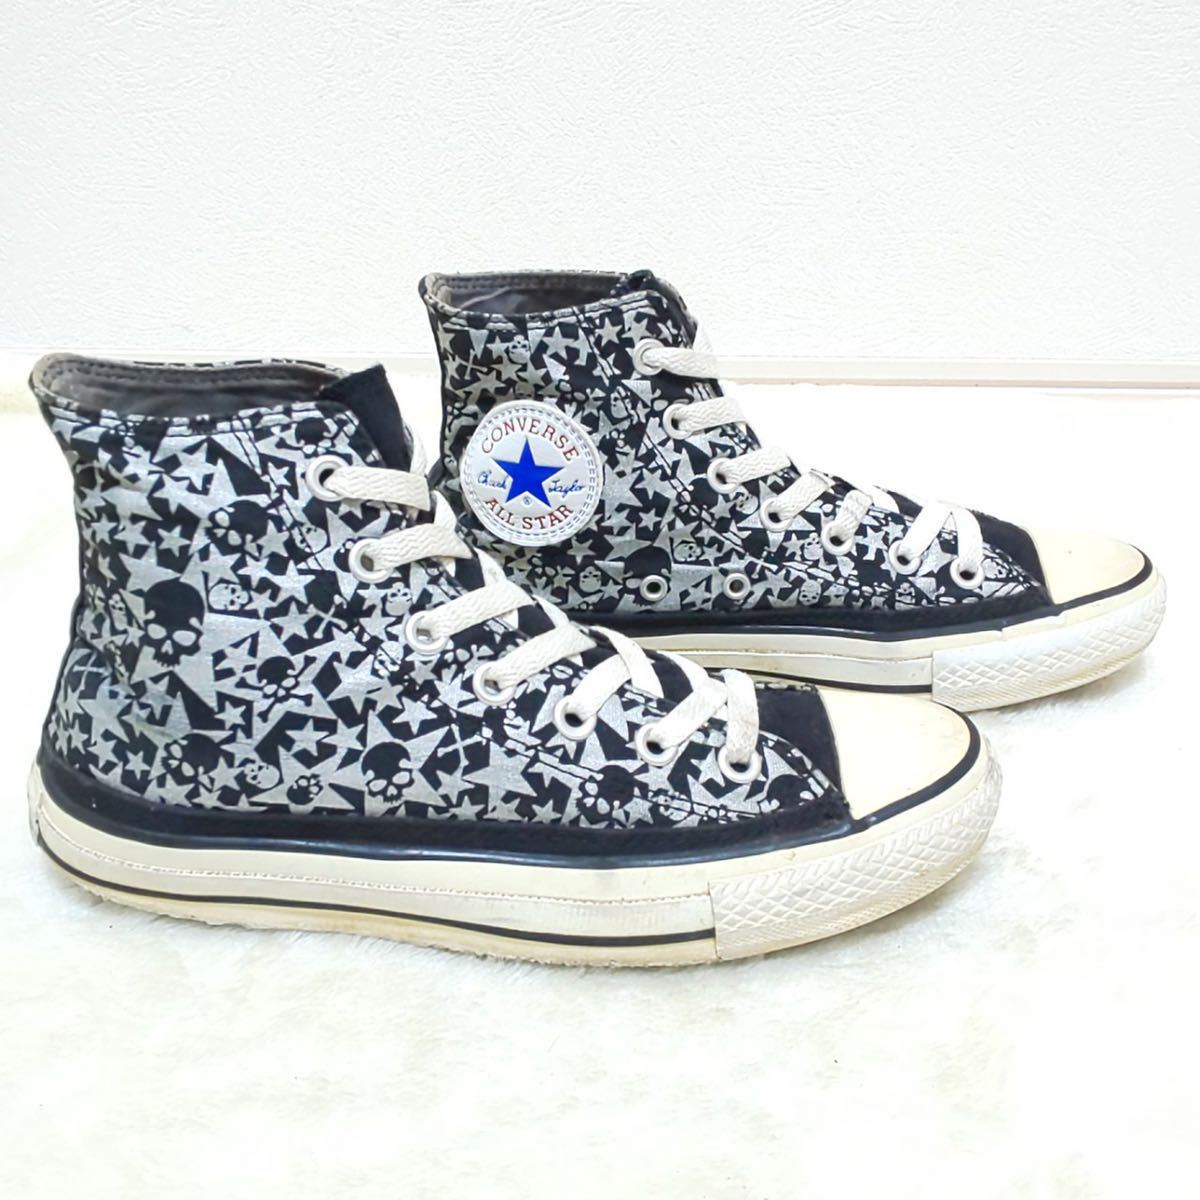 【CONVERSE】コンバースオールスター ALL STAR ハイカットスニーカー キャンバス ドクロ スカル ロック 黒 シルバー 靴 シューズ 24cm/jx_画像2